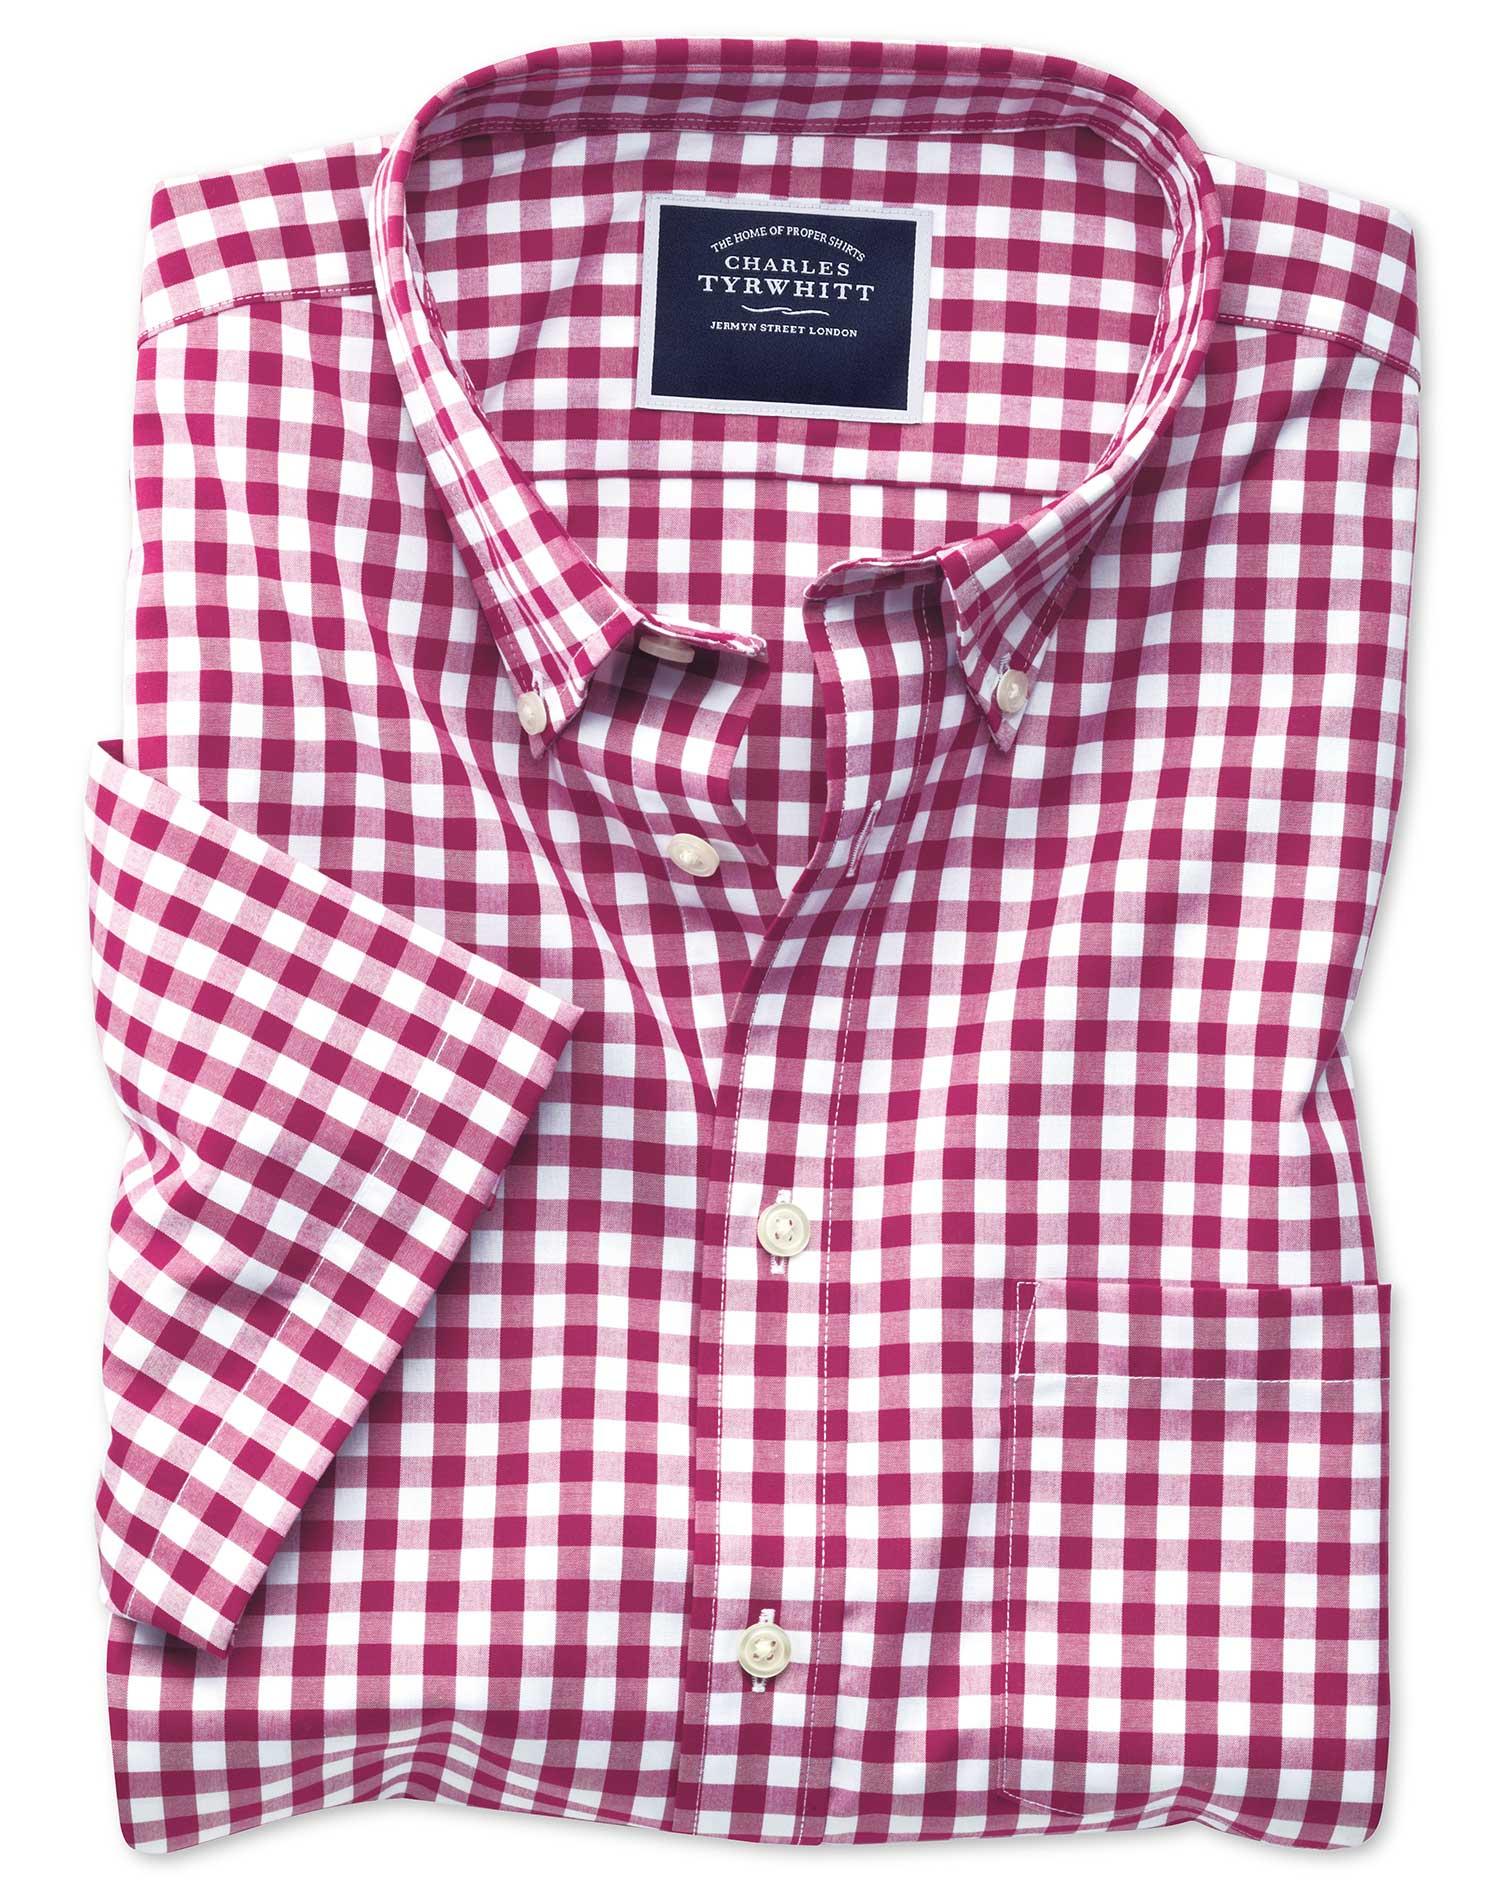 Classic Fit Button-Down Non-Iron Poplin Short Sleeve Raspberry Gingham Cotton Shirt Single Cuff Size